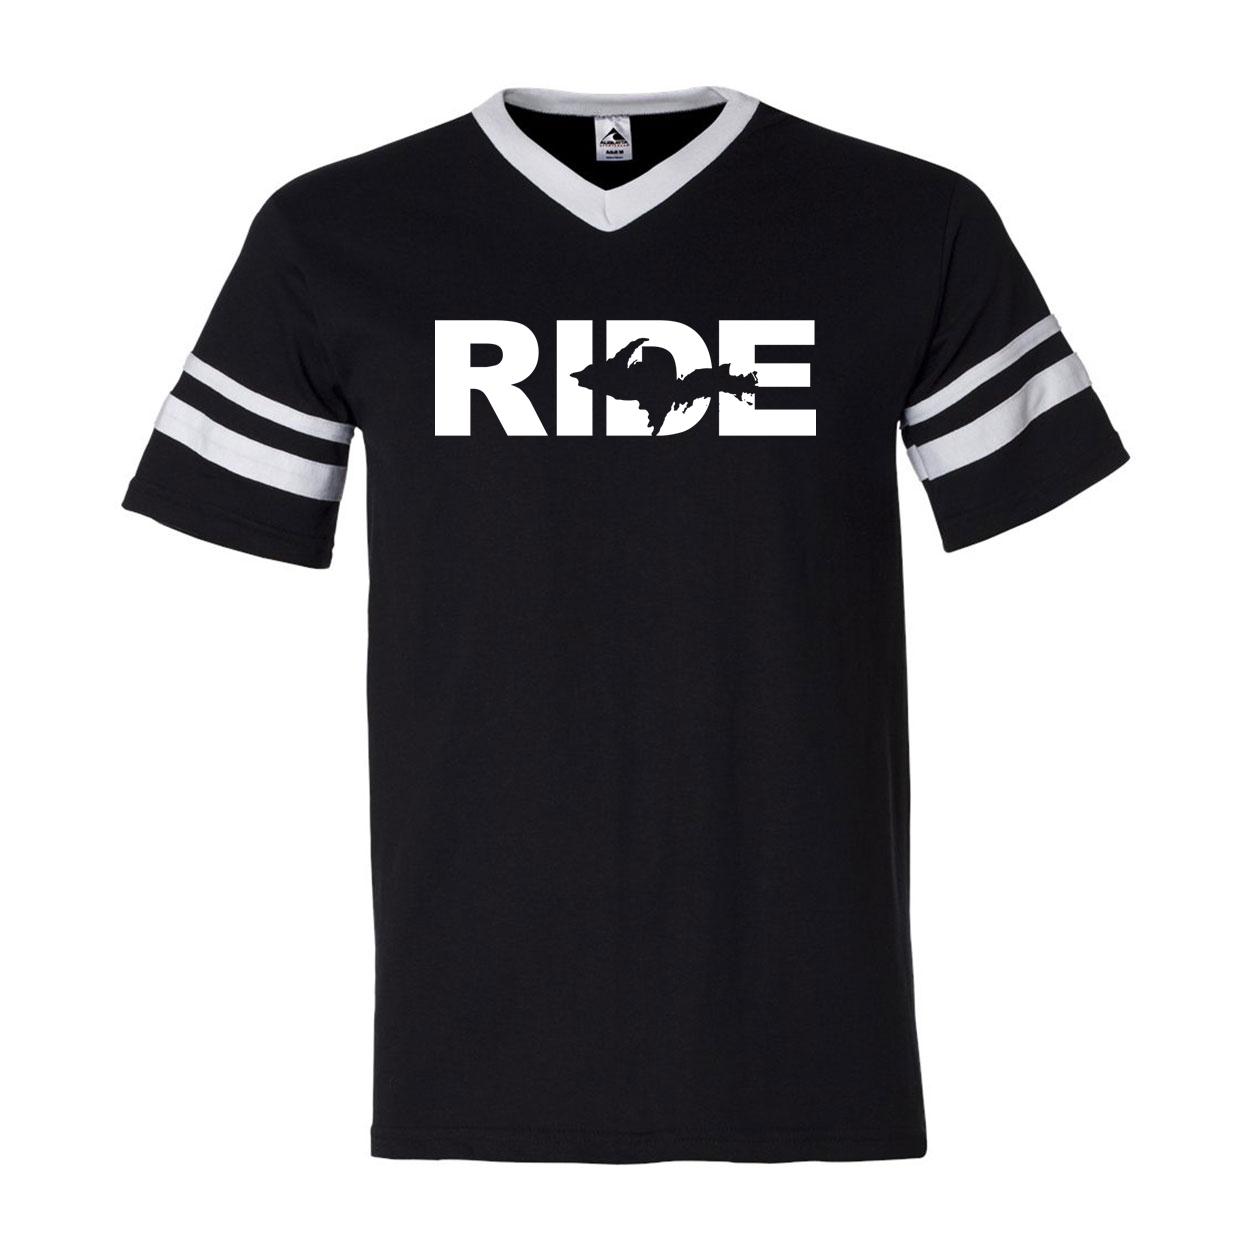 Ride Michigan UP Classic Premium Striped Jersey T-Shirt Black/White (White Logo)